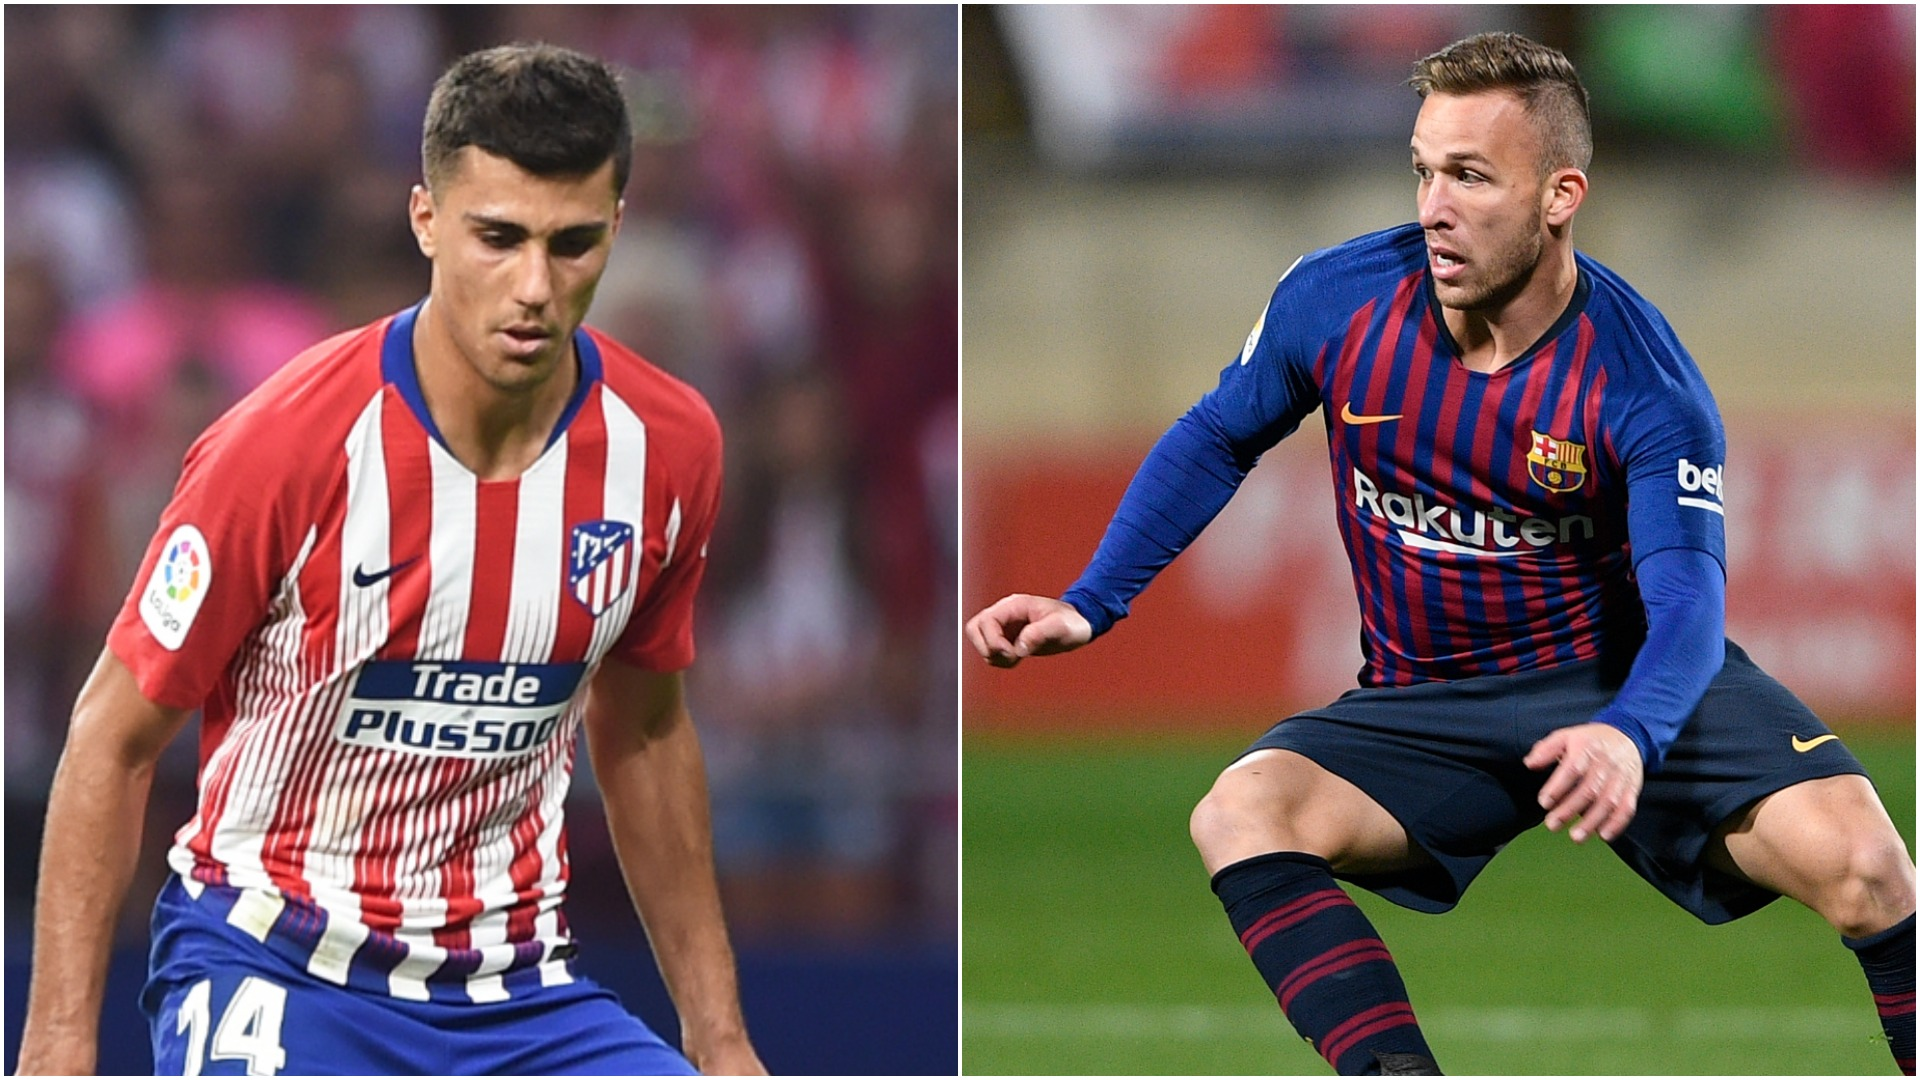 Atletico Madrid v Barcelona: 2018-19 signings compared